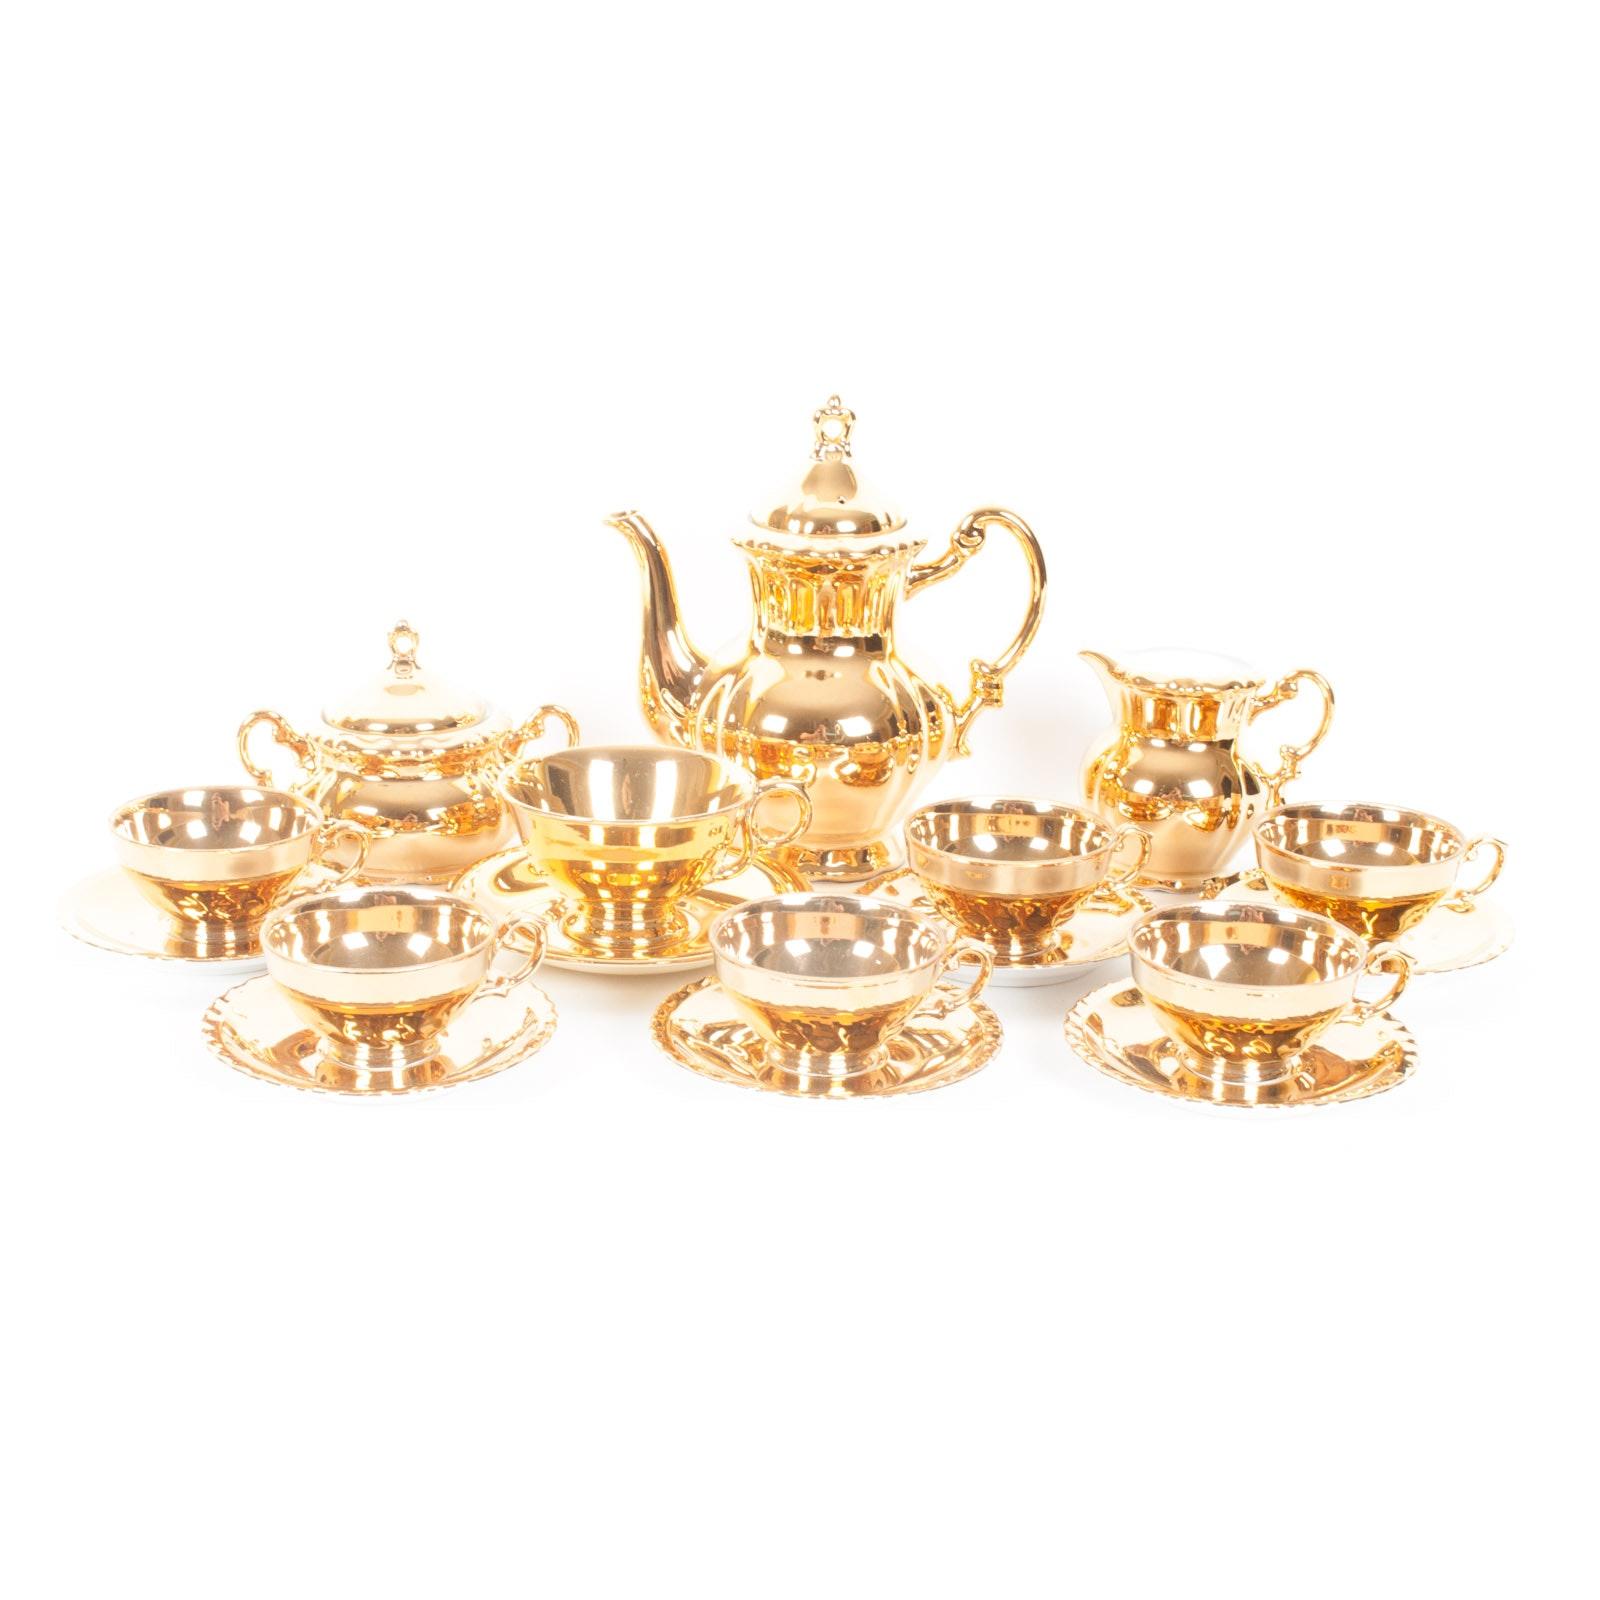 Original Arnart Creation of Japan Demitasse Tea Set